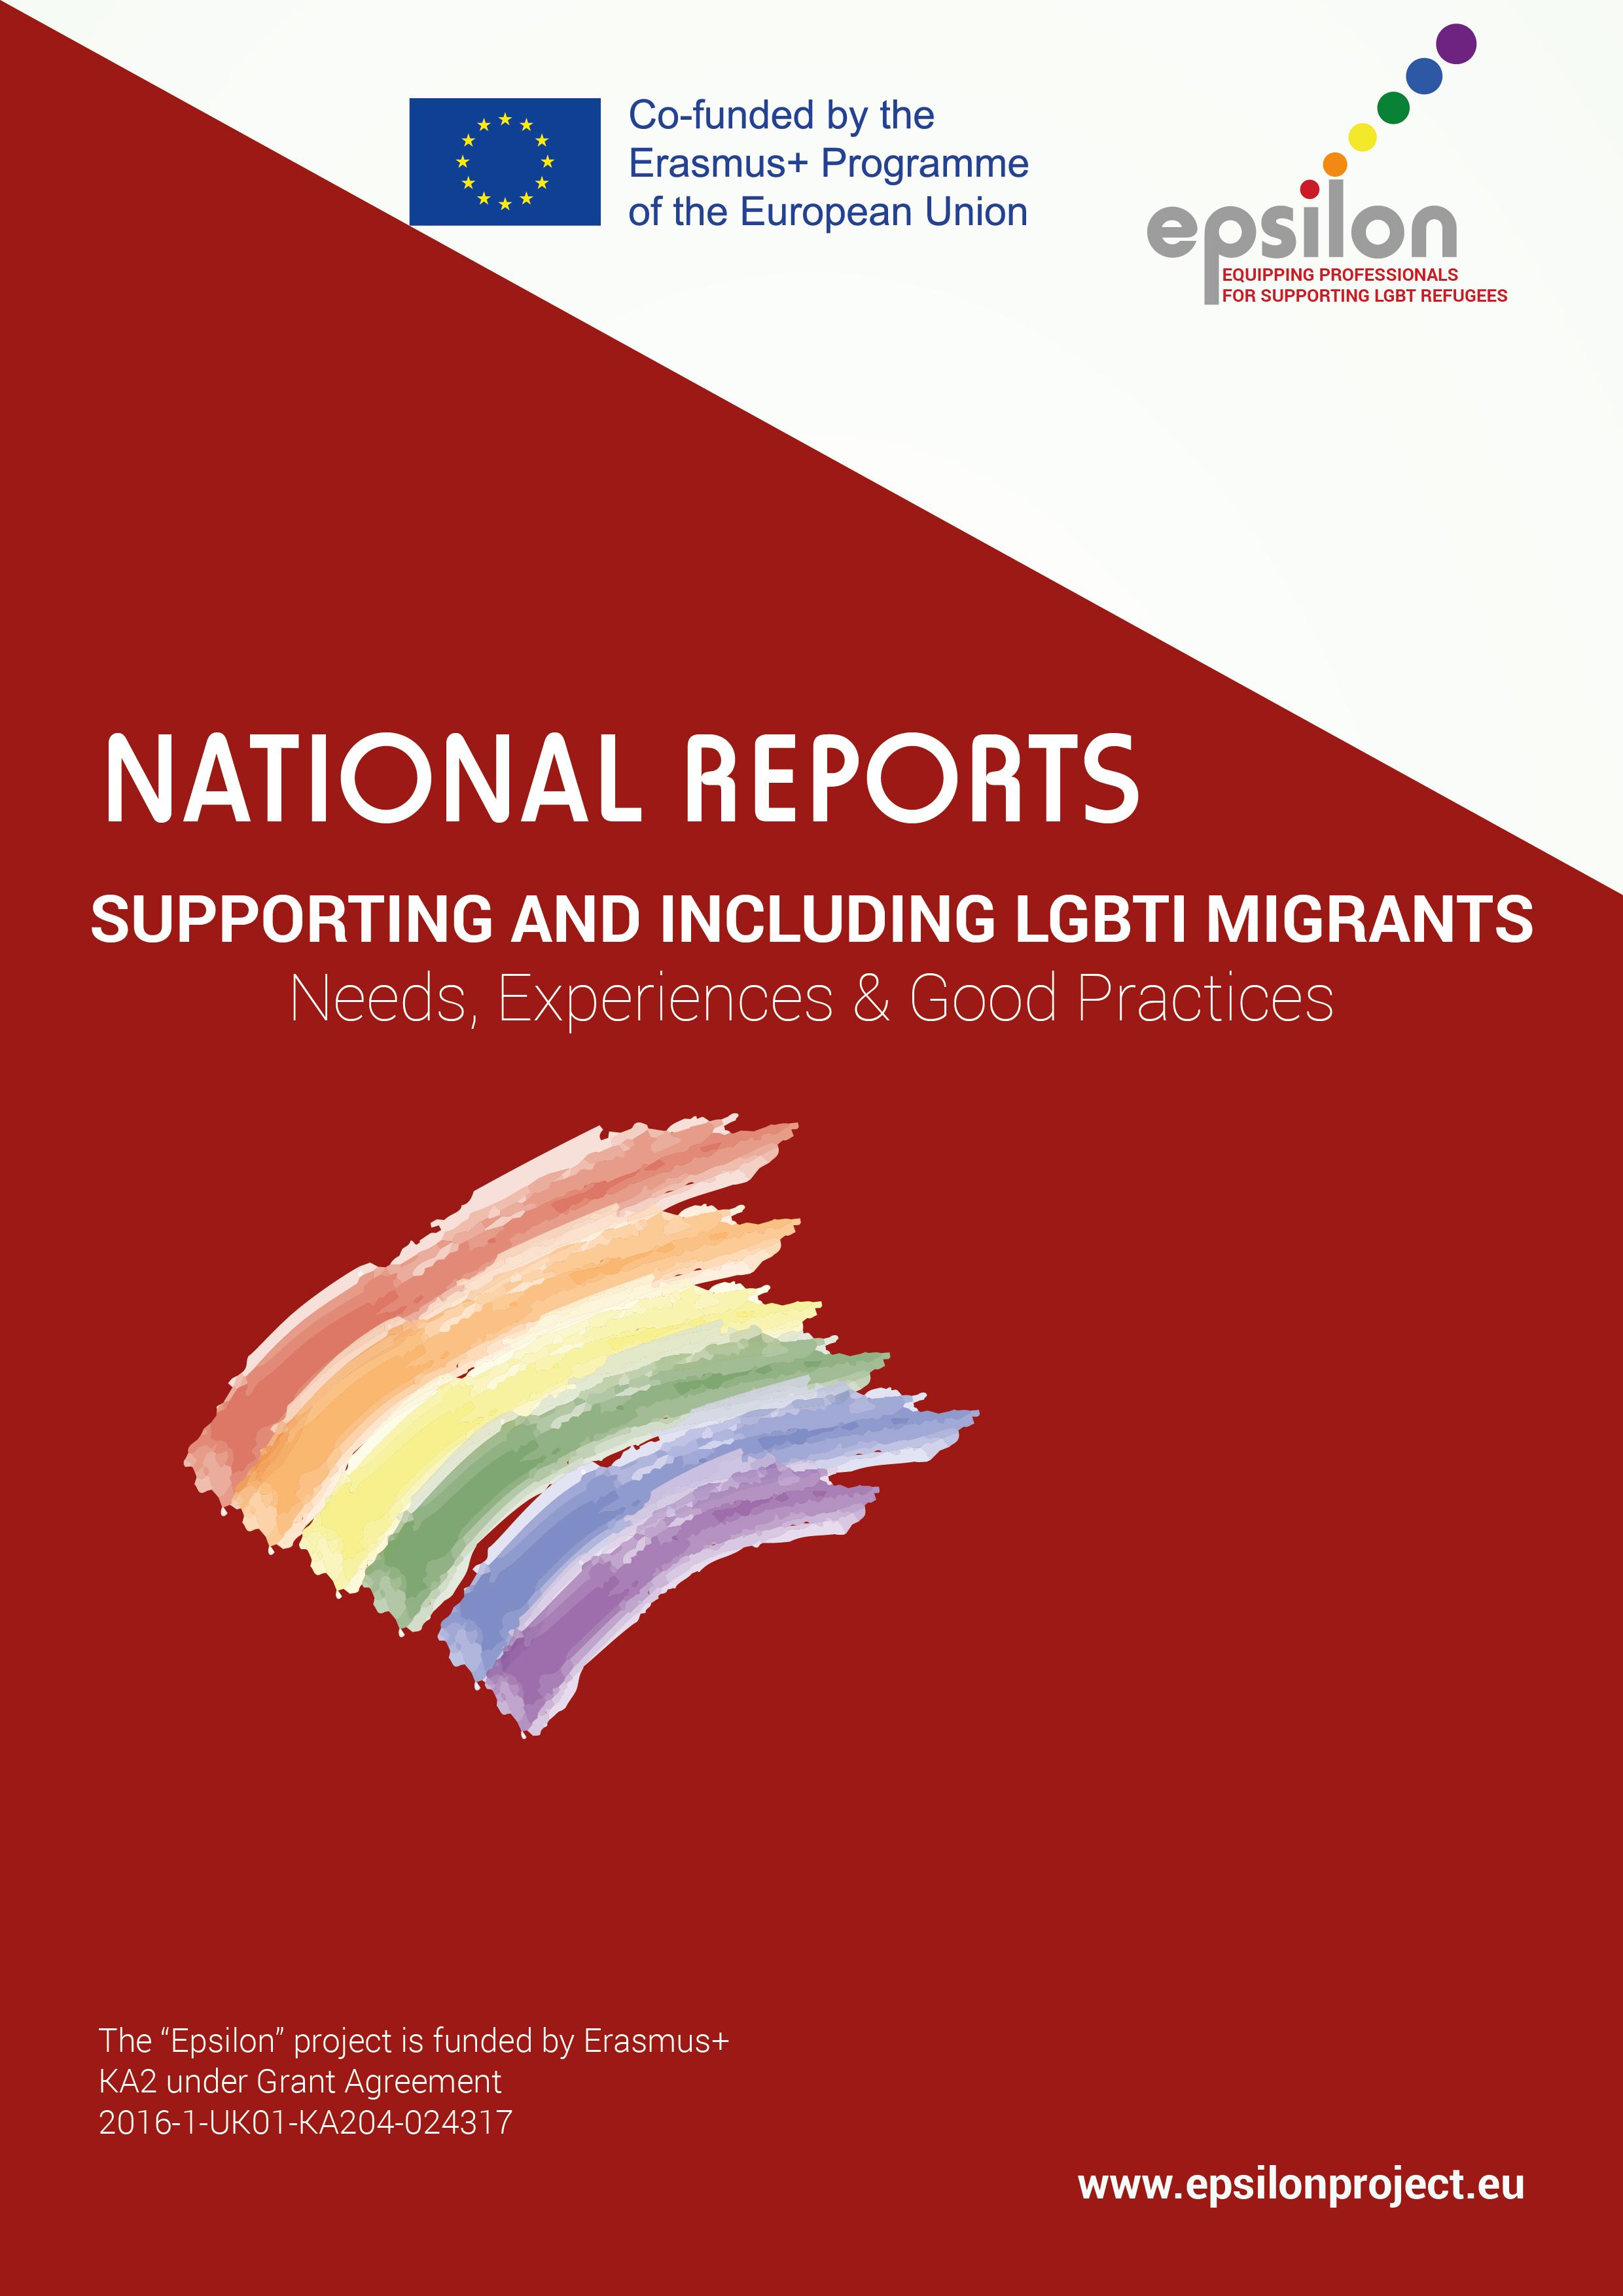 Epsilon Project National Reports